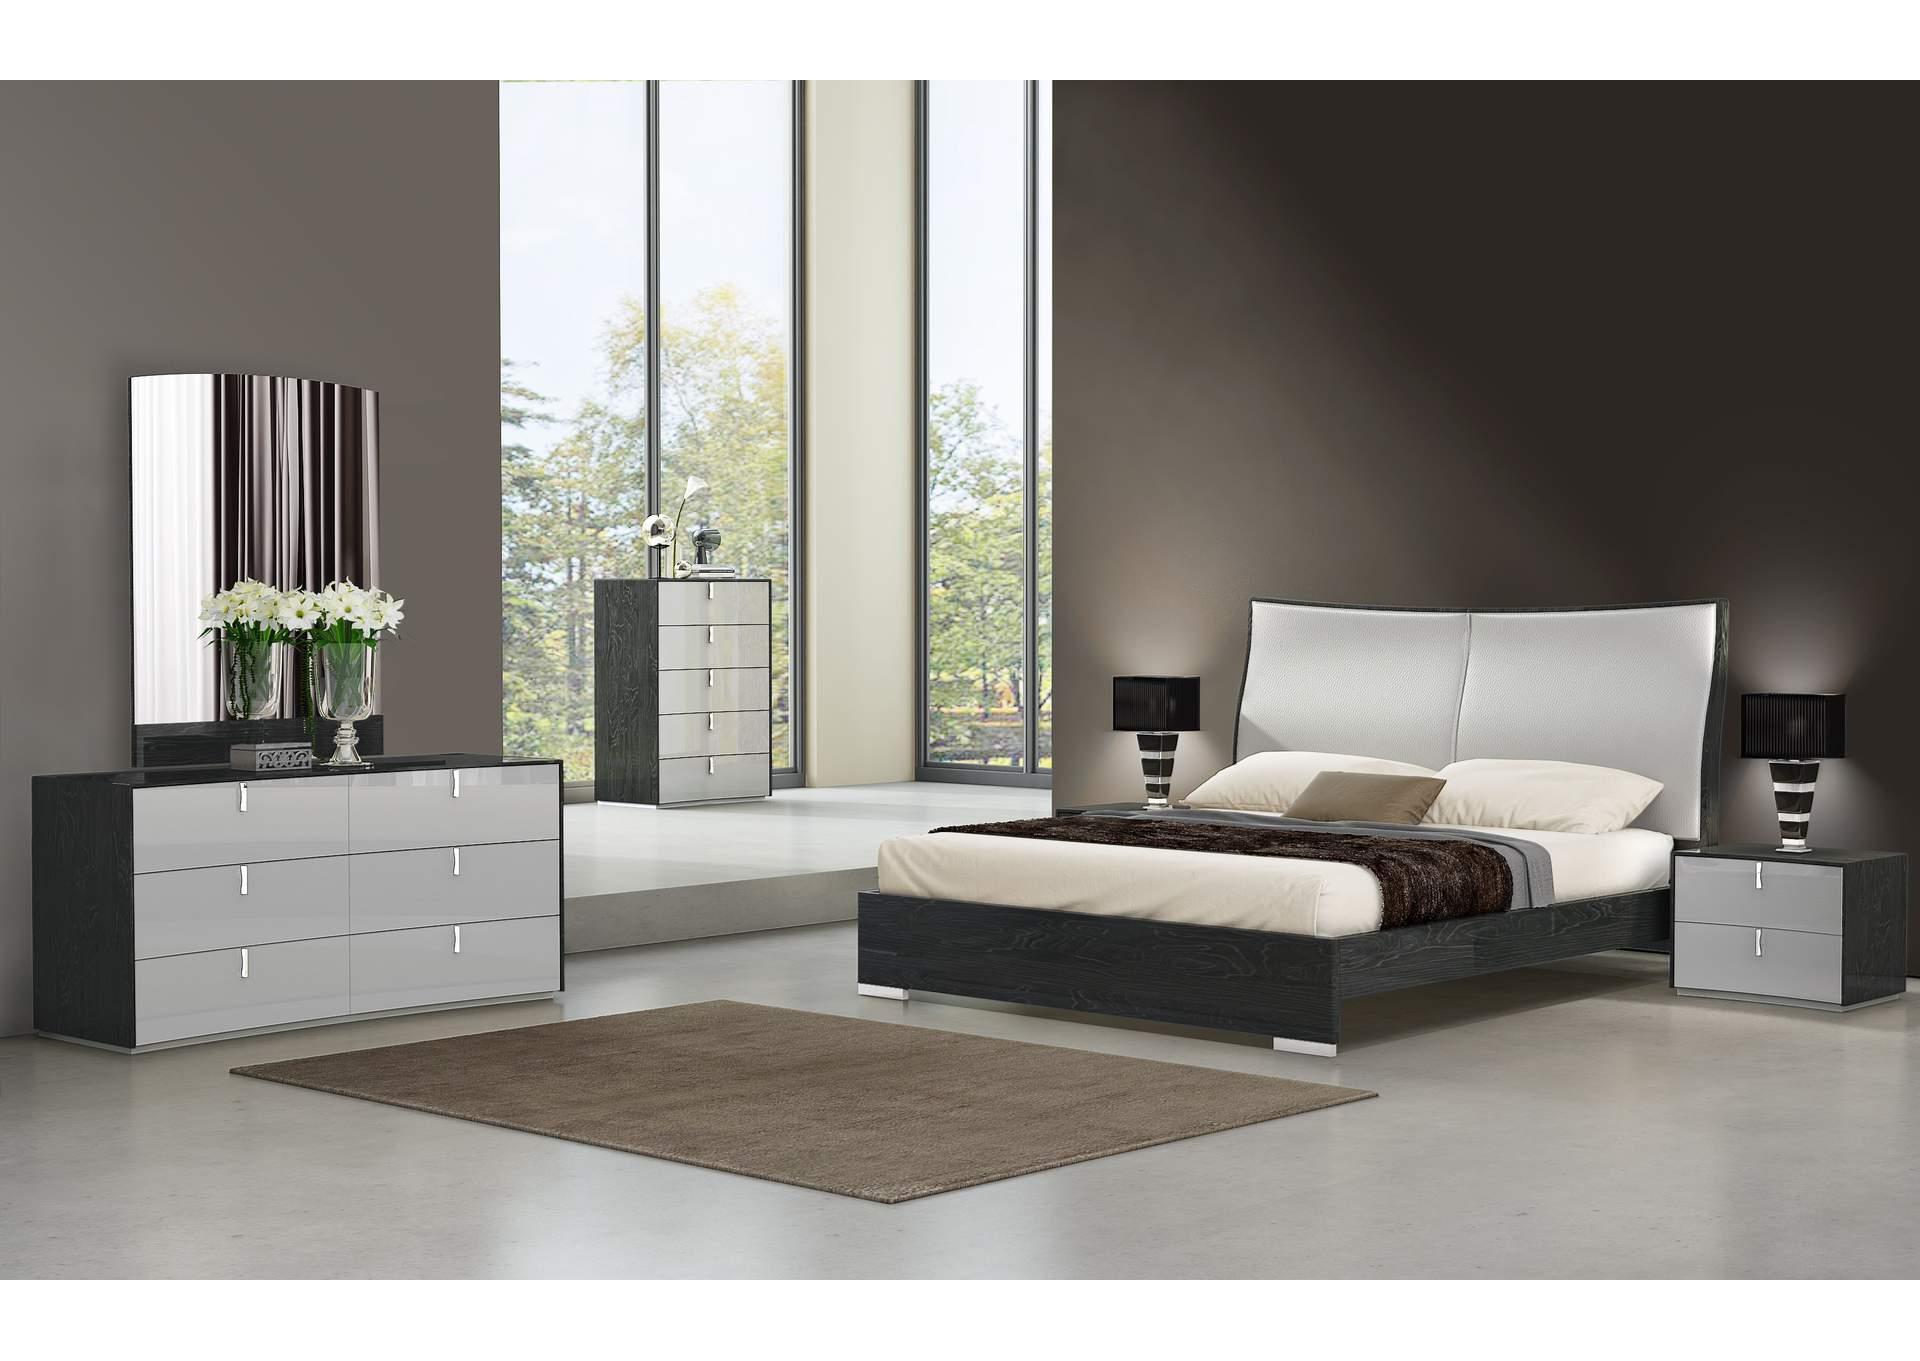 harlem furniture